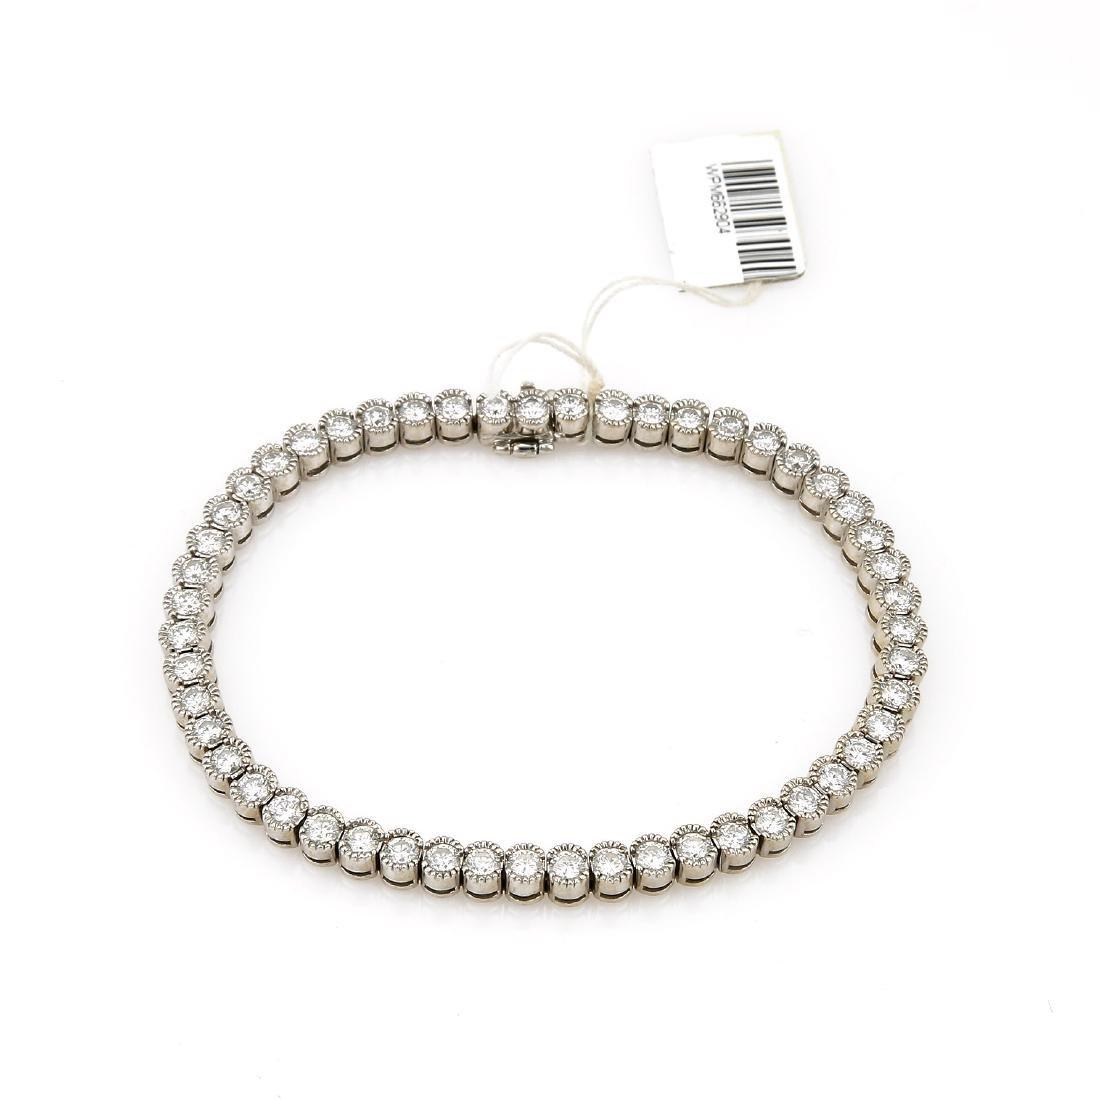 18k White Gold Diamond Tennis Bracelet - 2